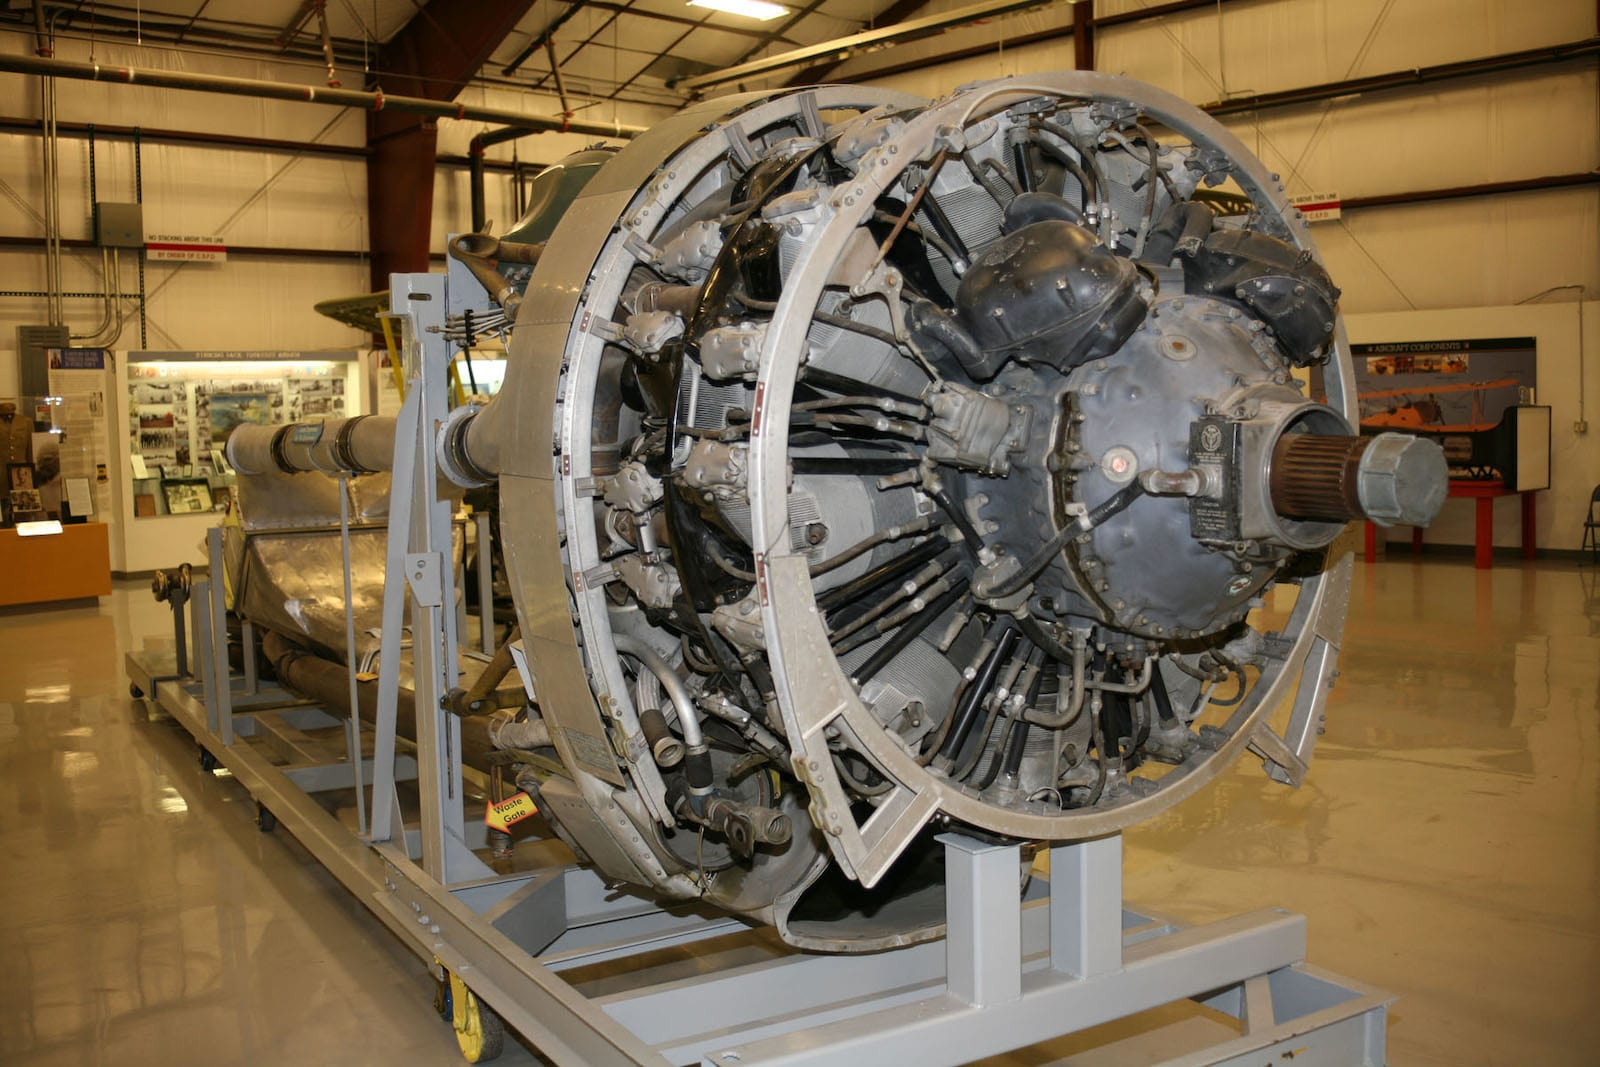 Colorado Springs National Museum of World War II Aviation Propeller Engine